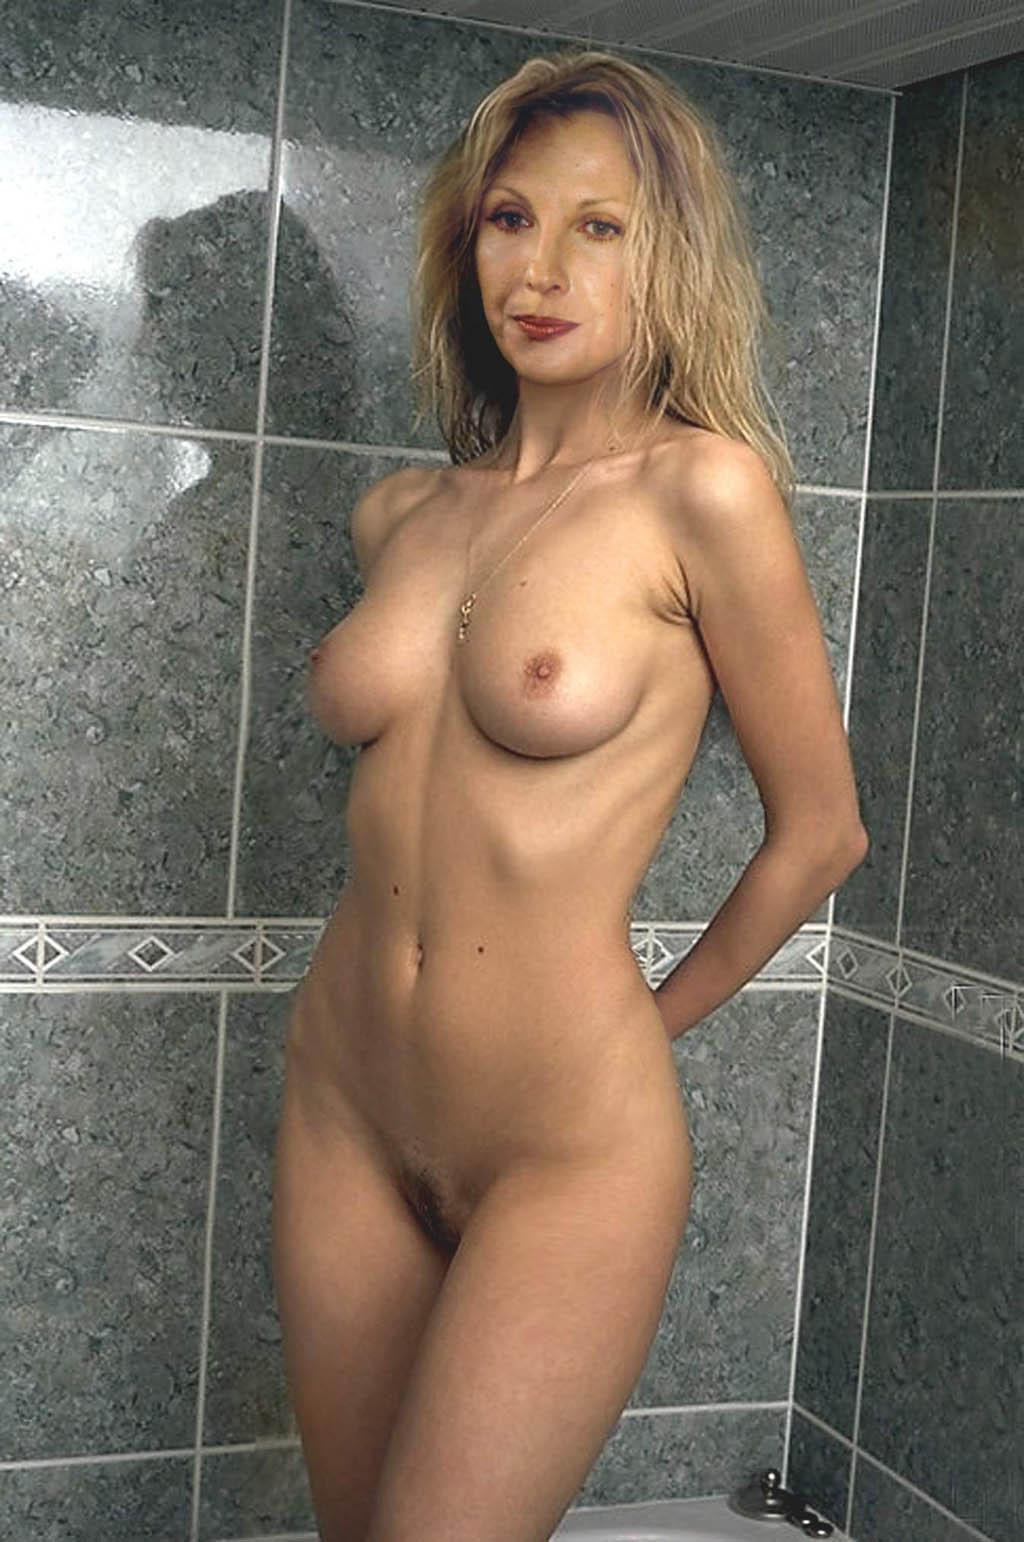 Яковлева актриса порно 9 фотография